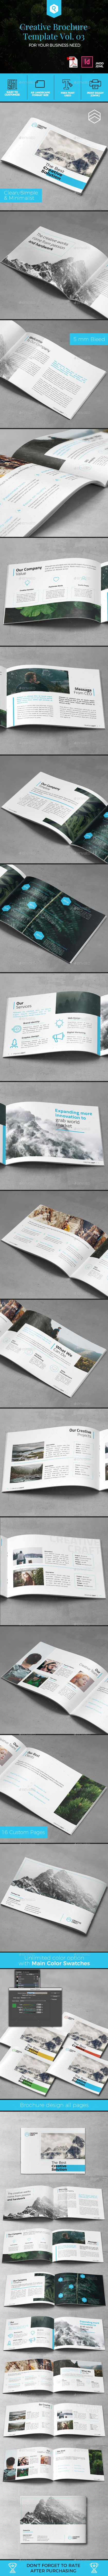 A5 Creative Brochure Template Vol. 03 - Corporate Brochures